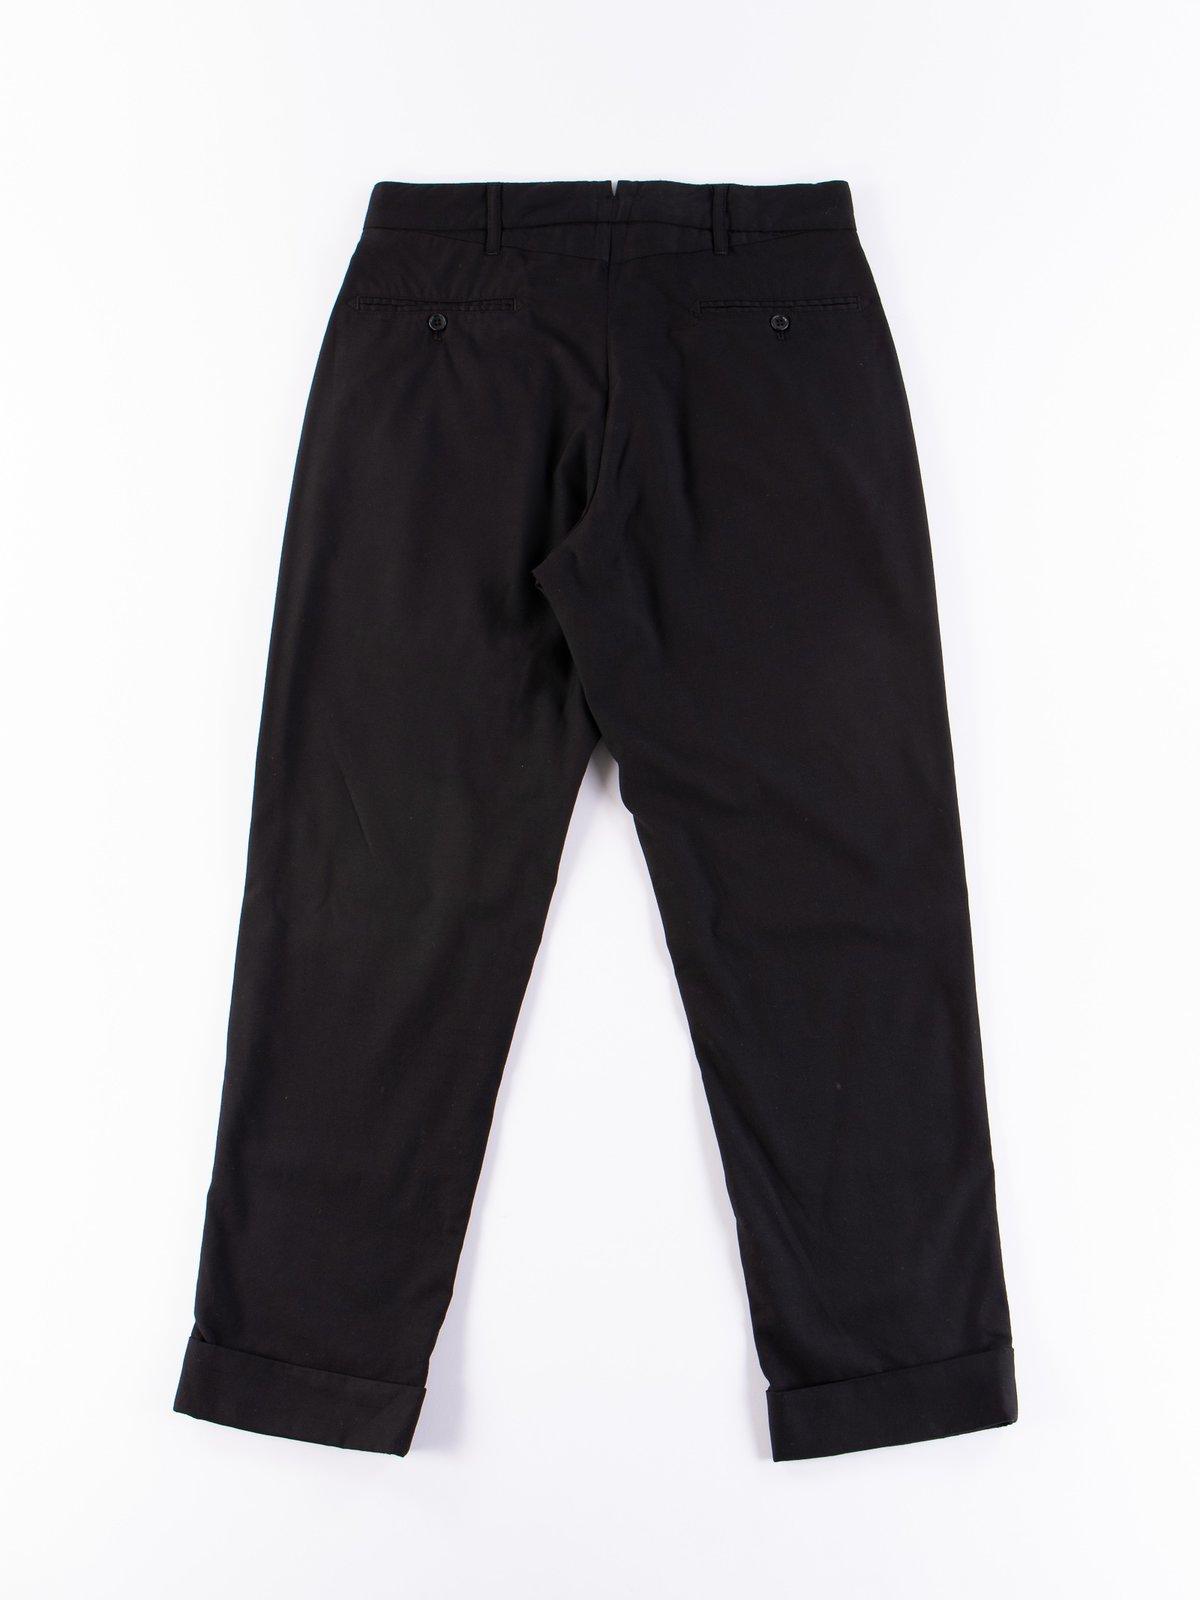 Black Worsted Wool Gabardine Andover Pant - Image 6